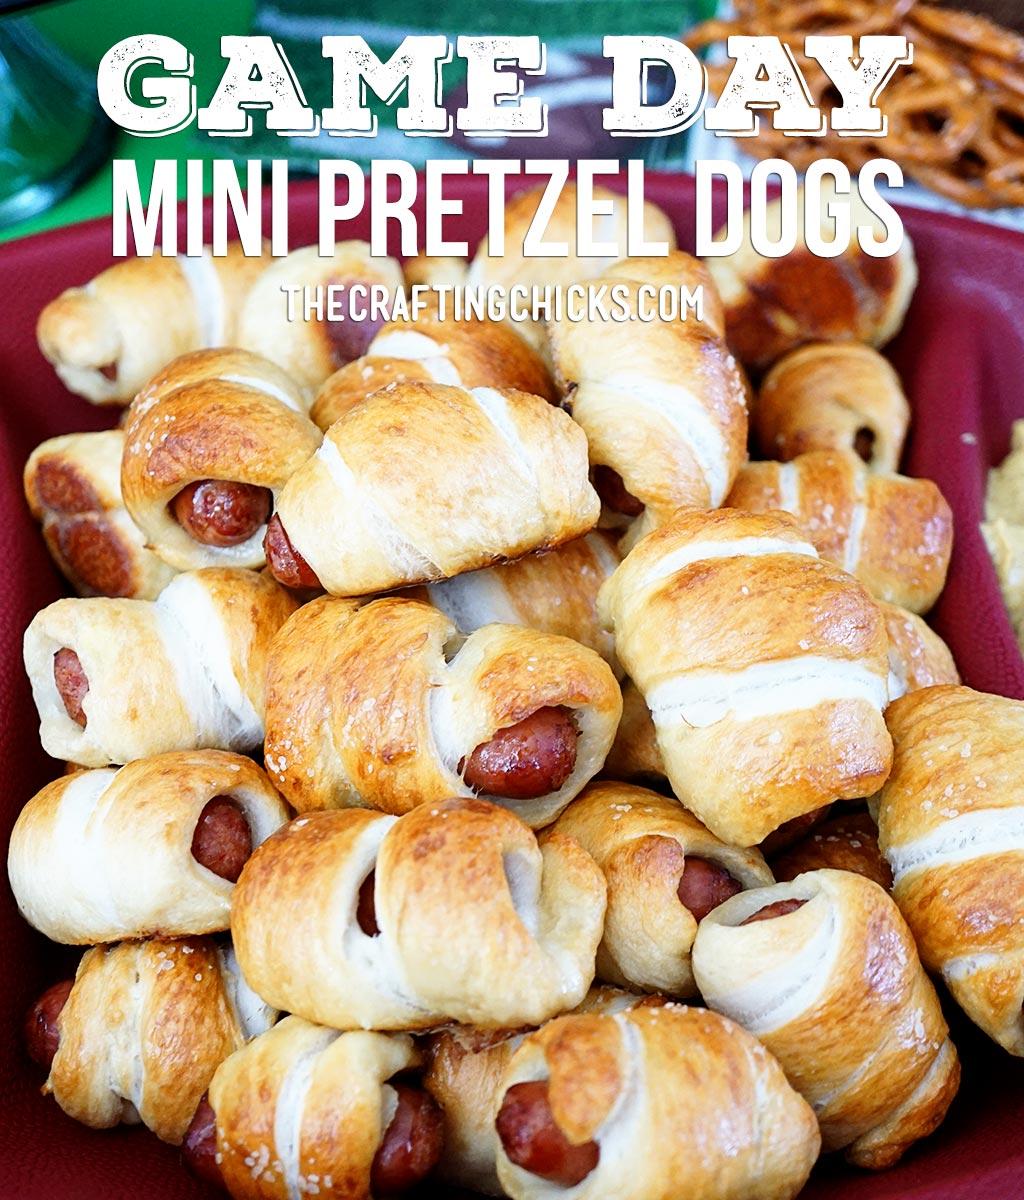 Game Day Mini Pretzel Dogs is a favorite Superbowl recipe!